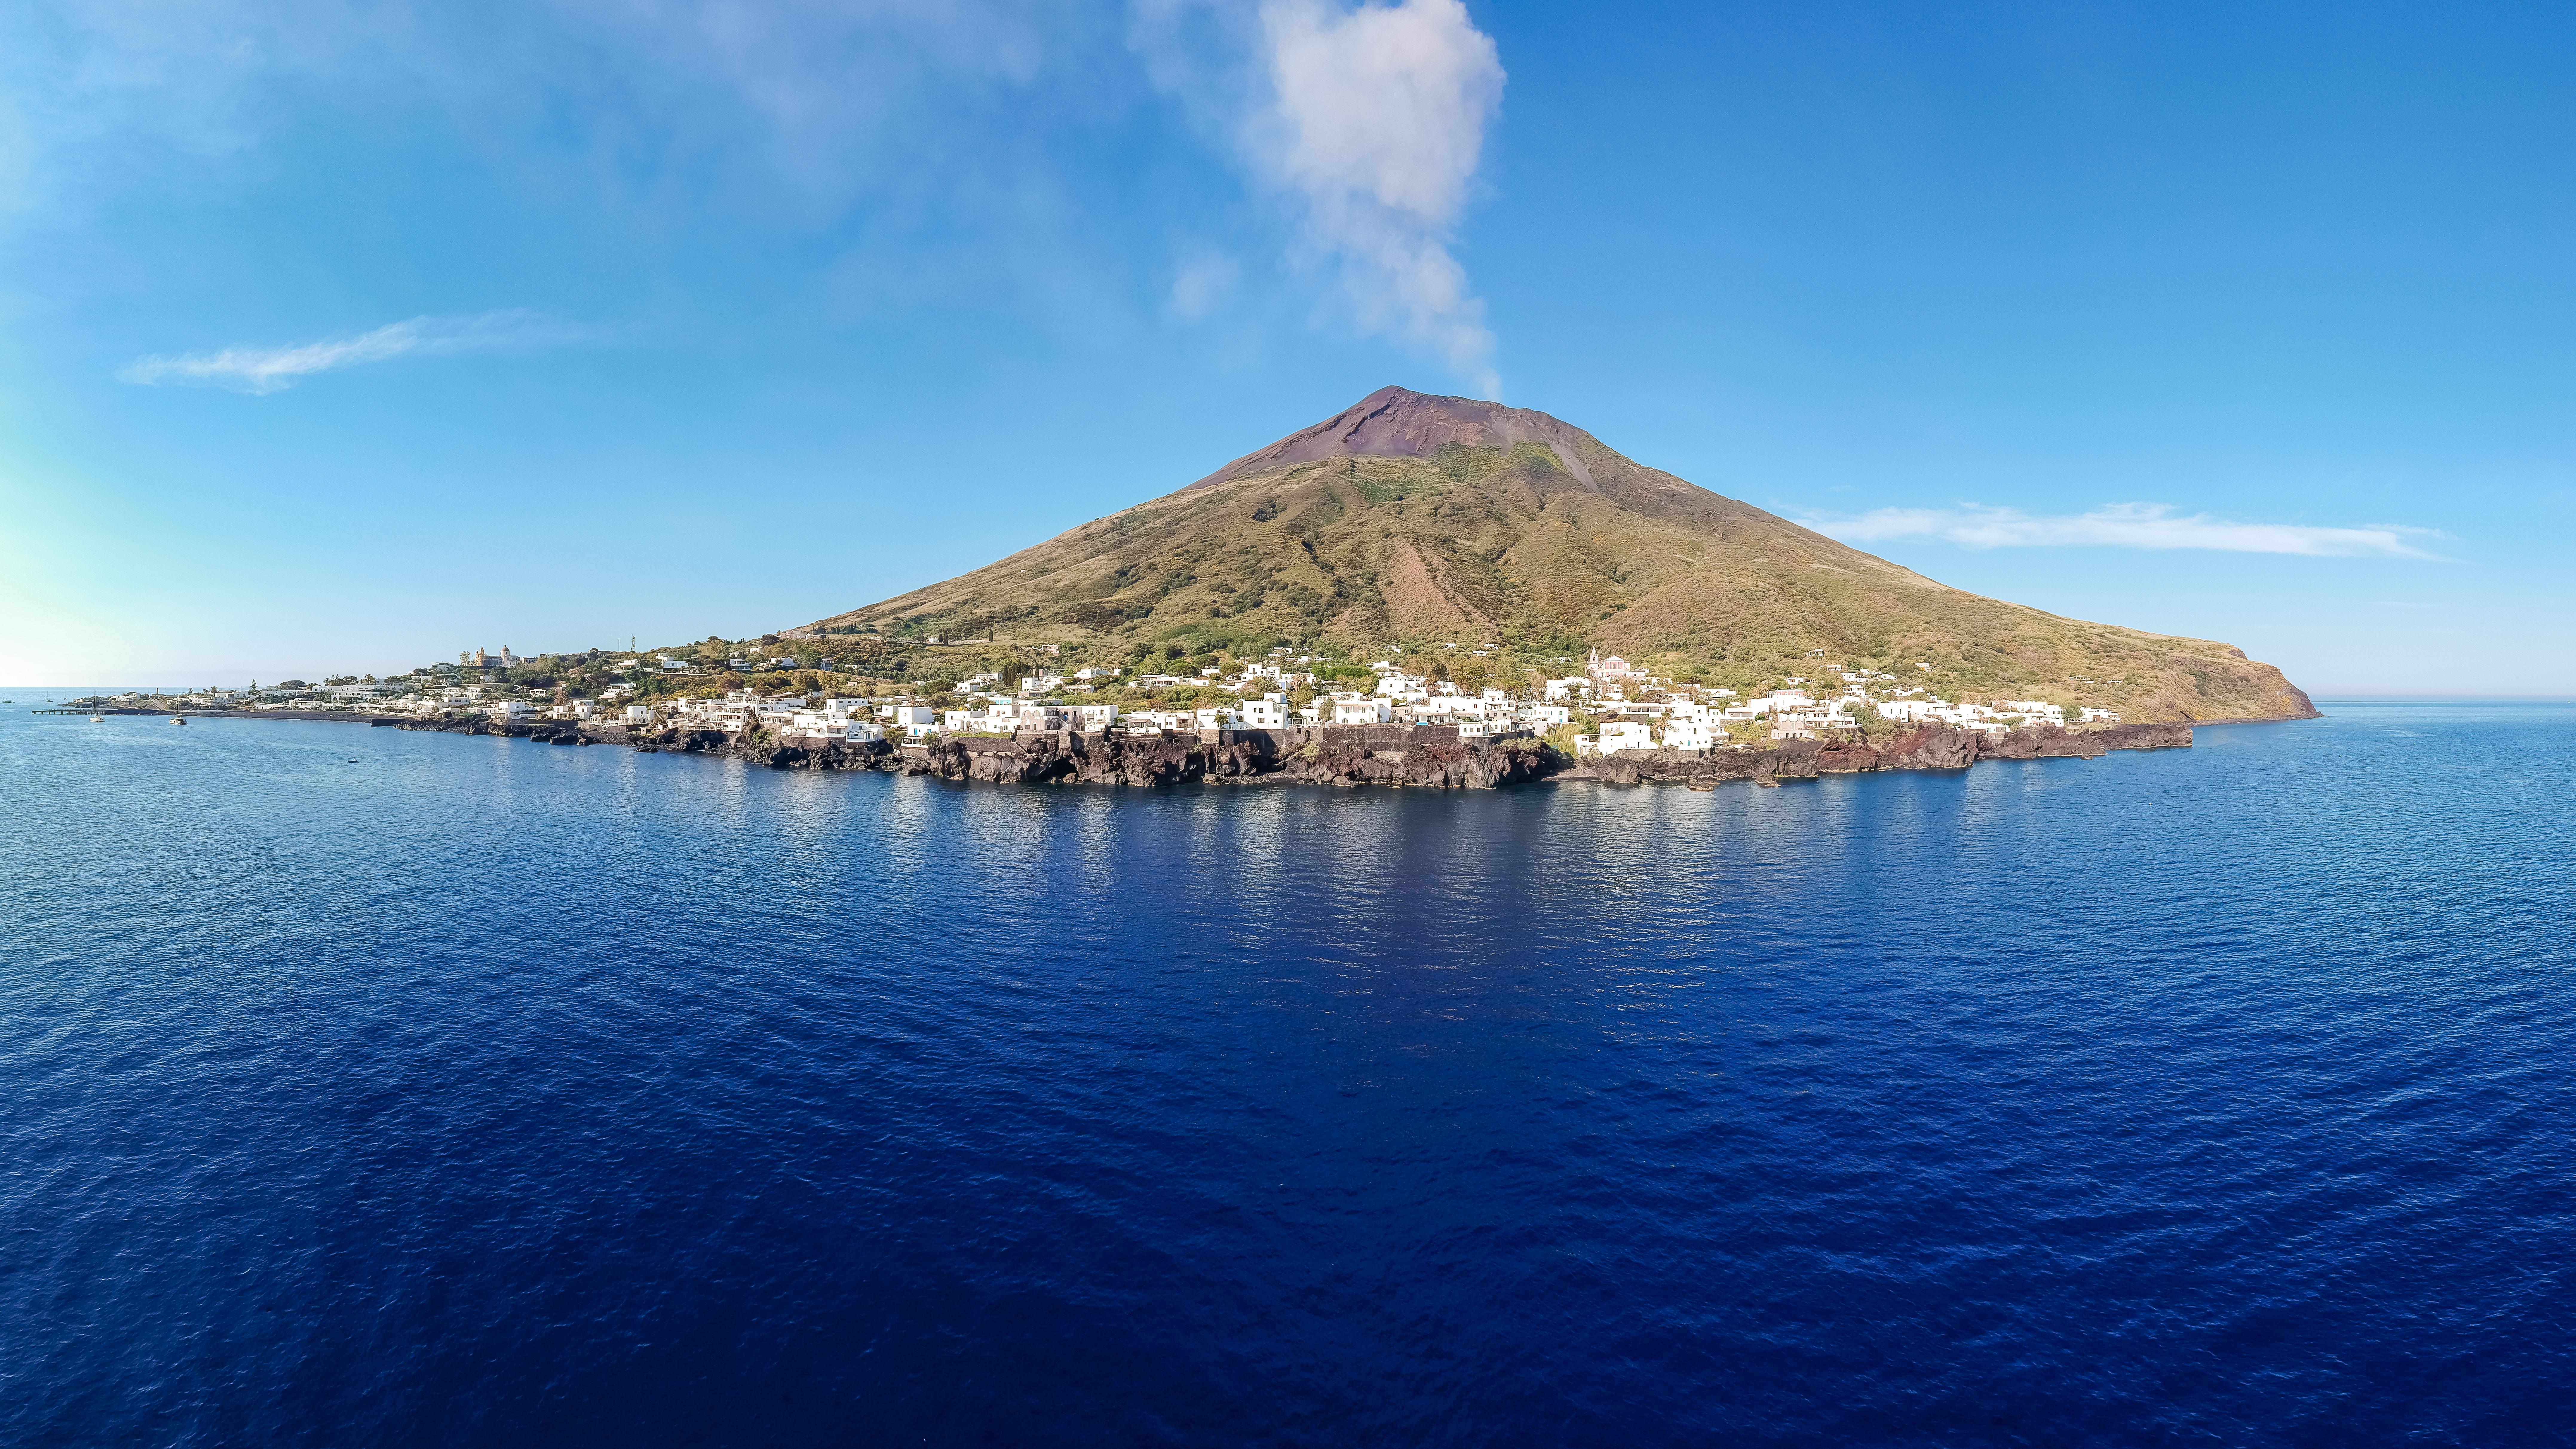 El volcán de Stromboli